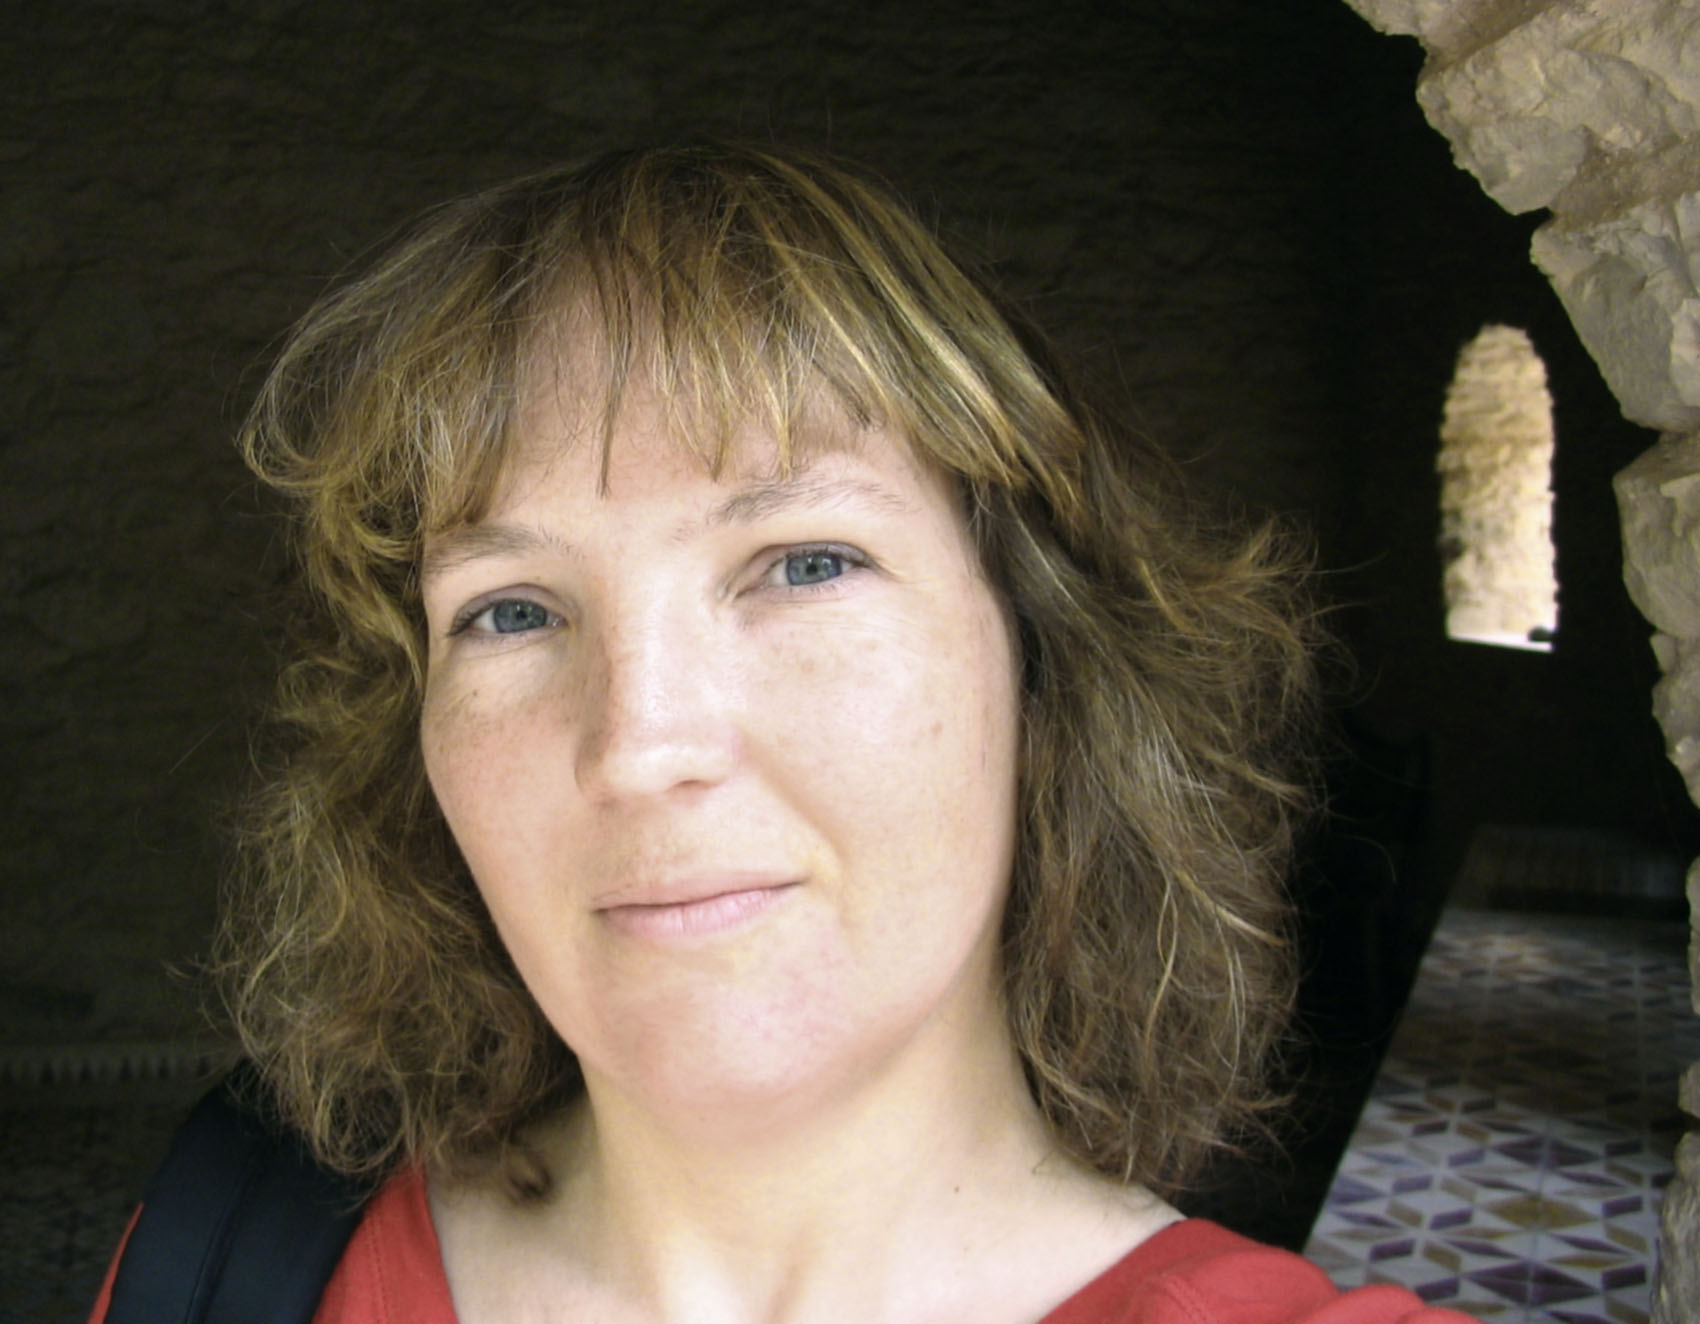 Florence Devouard, Kumusha Takes Wiki Co-Project Manager